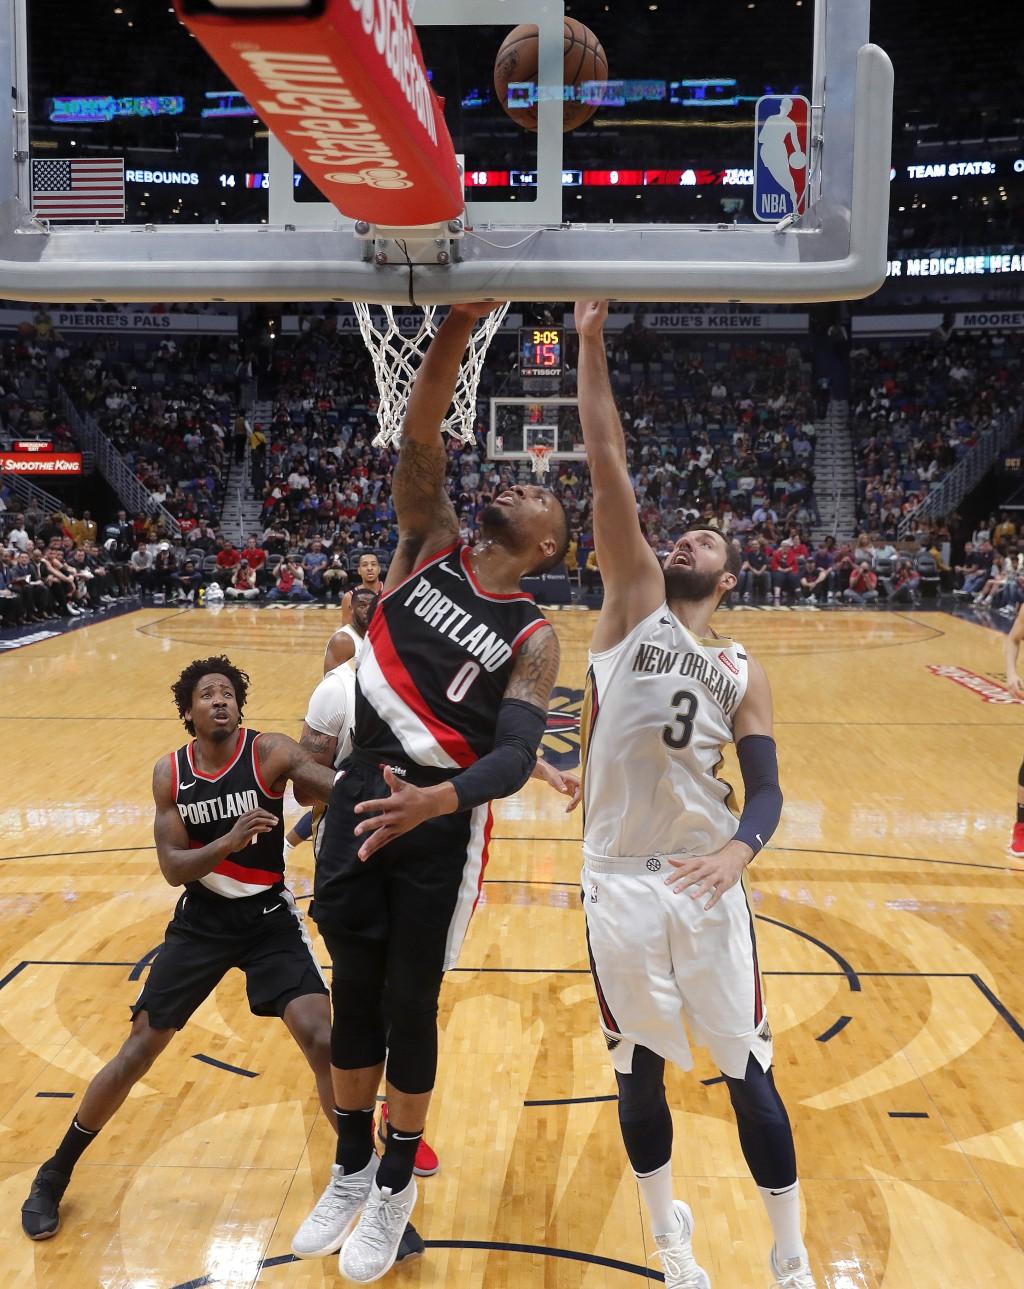 fba16bb9e225 Portland Trail Blazers guard Damian Lillard (0) goes to the basket against  New Orleans